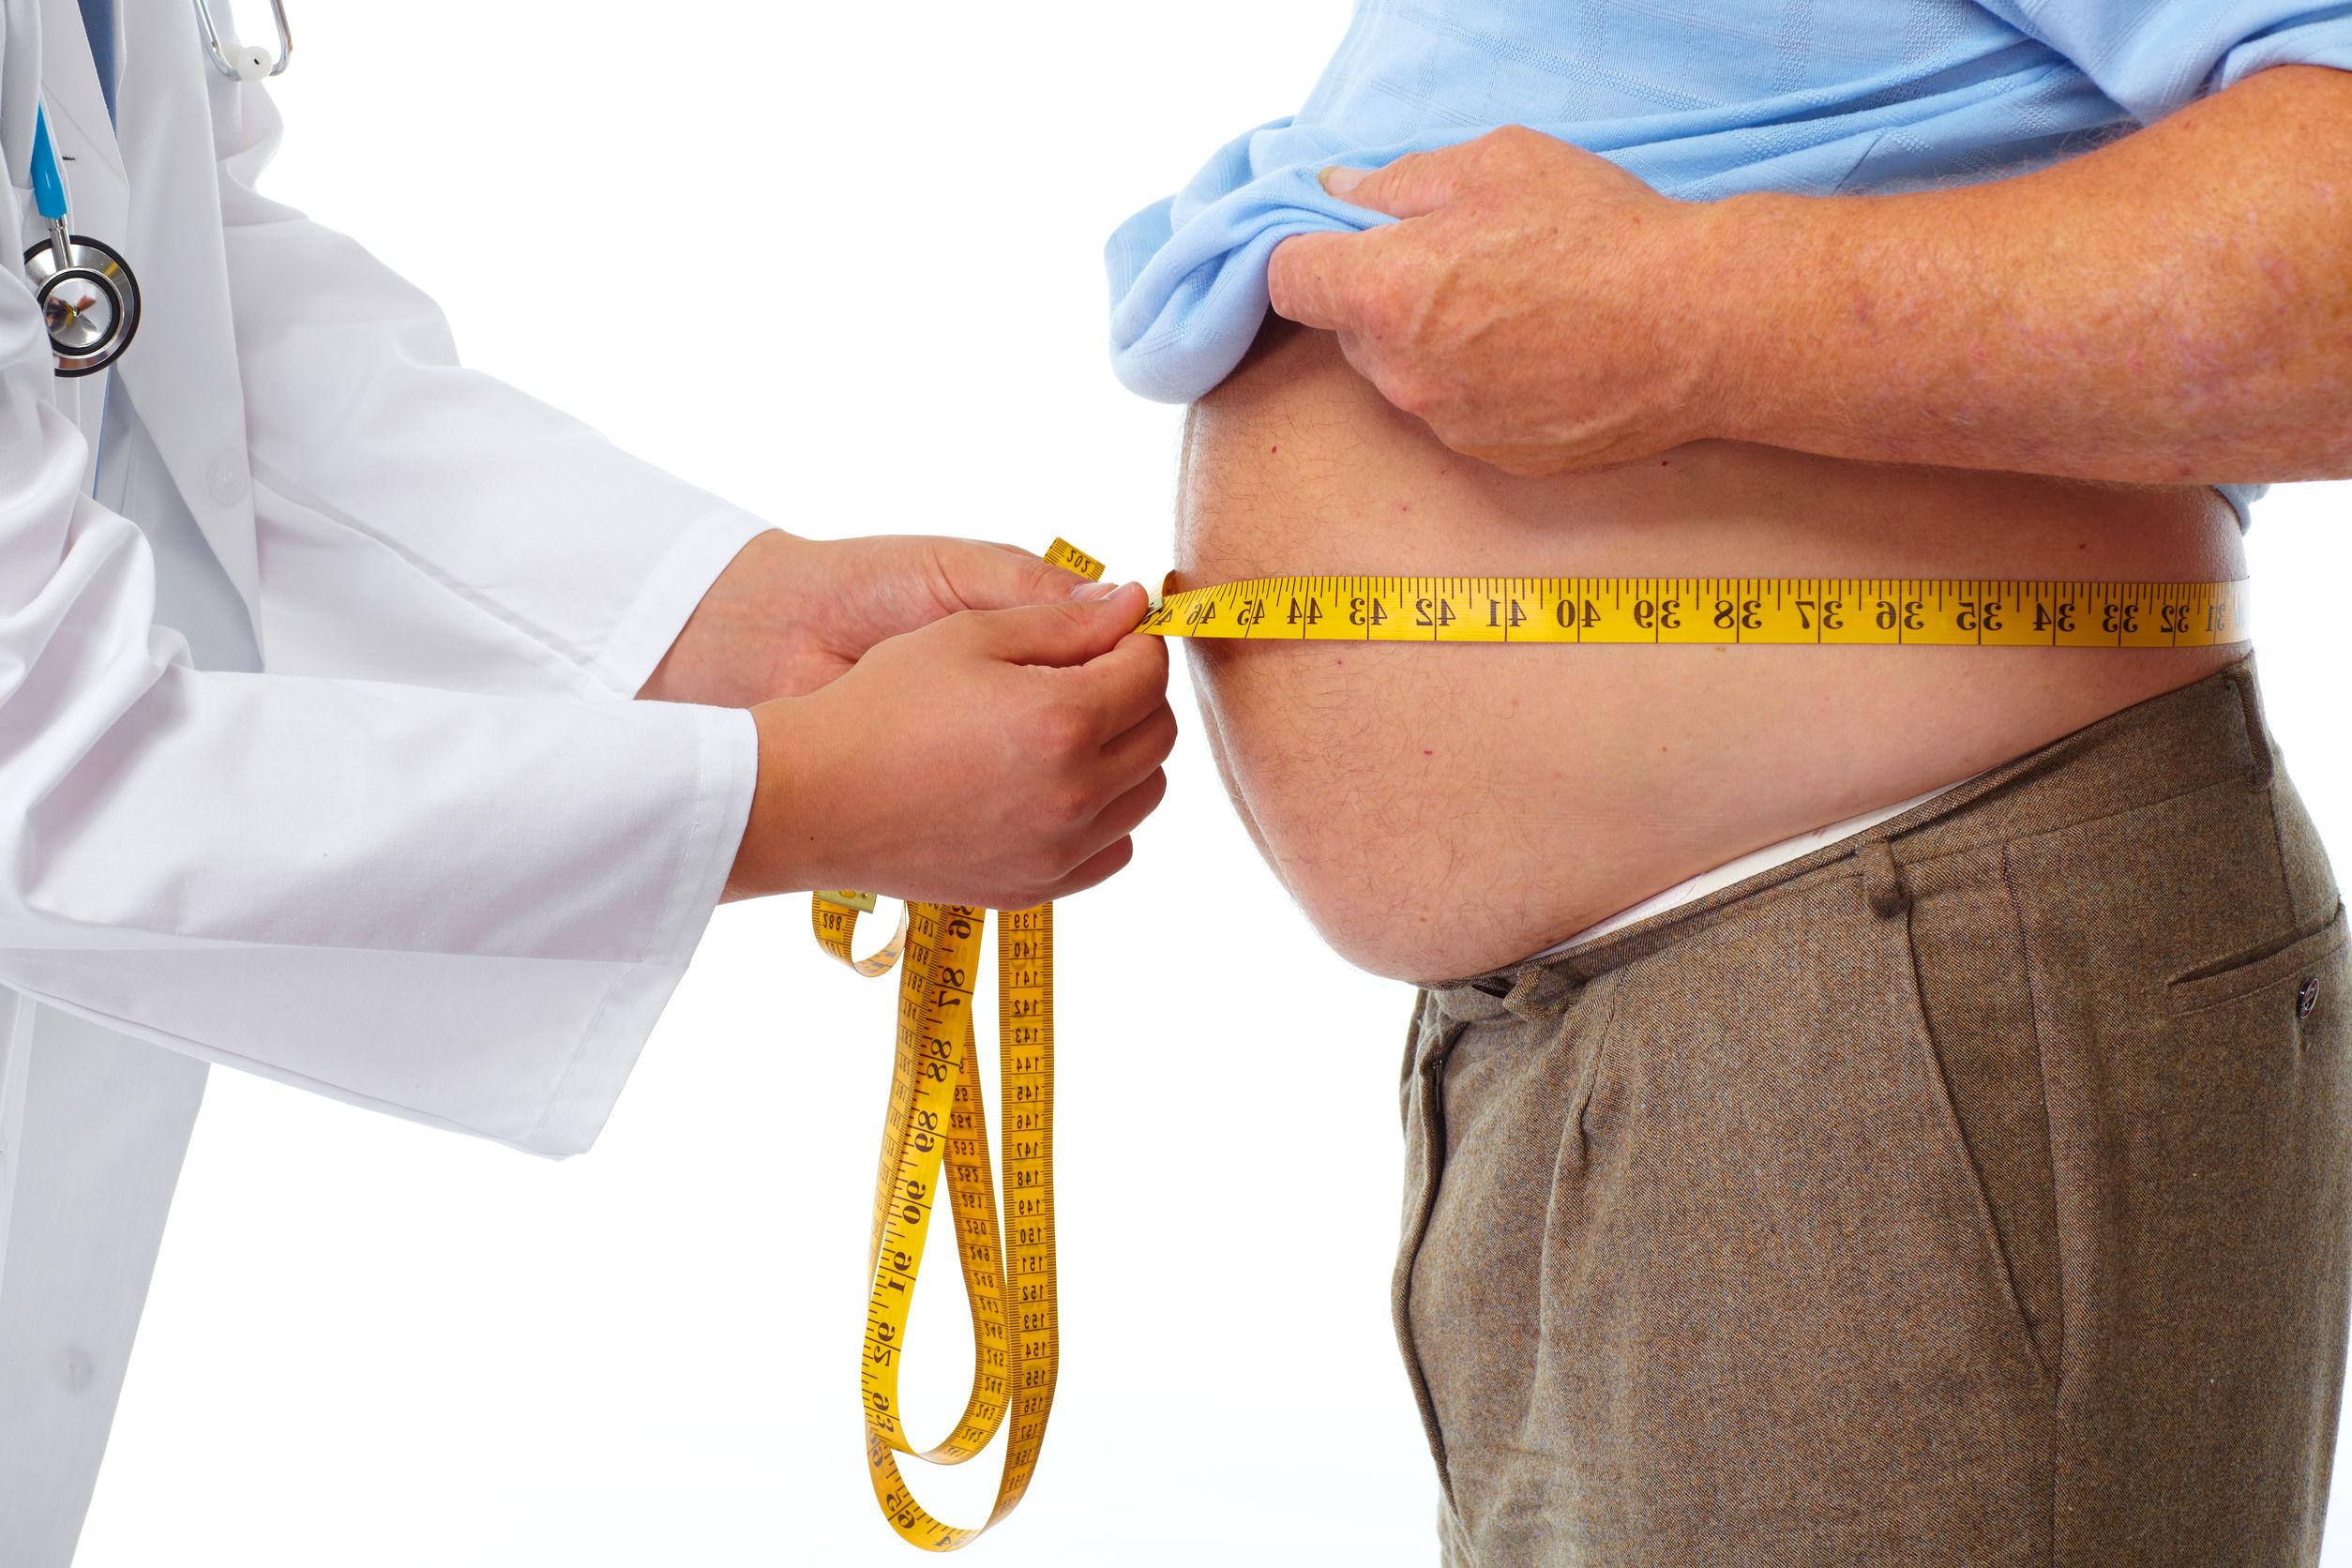 vóvulo gástrico fisiopatología de la diabetes